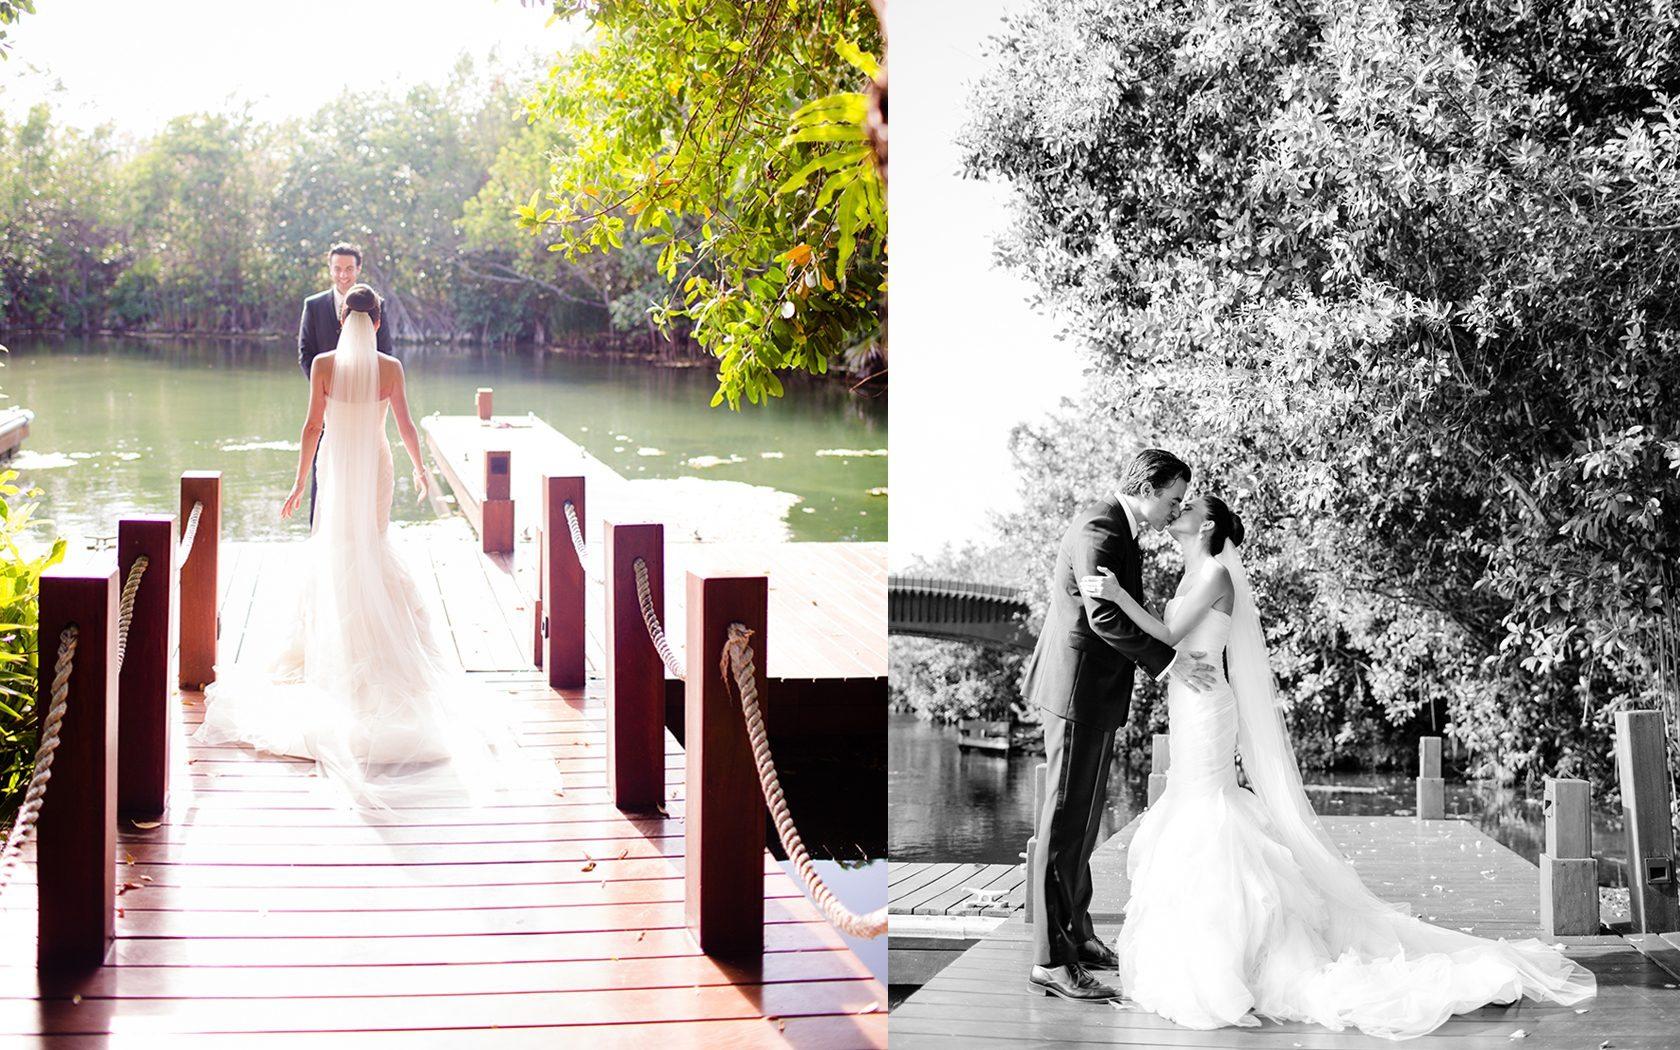 Fairmont_Mayakoba_Wedding_025-1680x1050.jpg